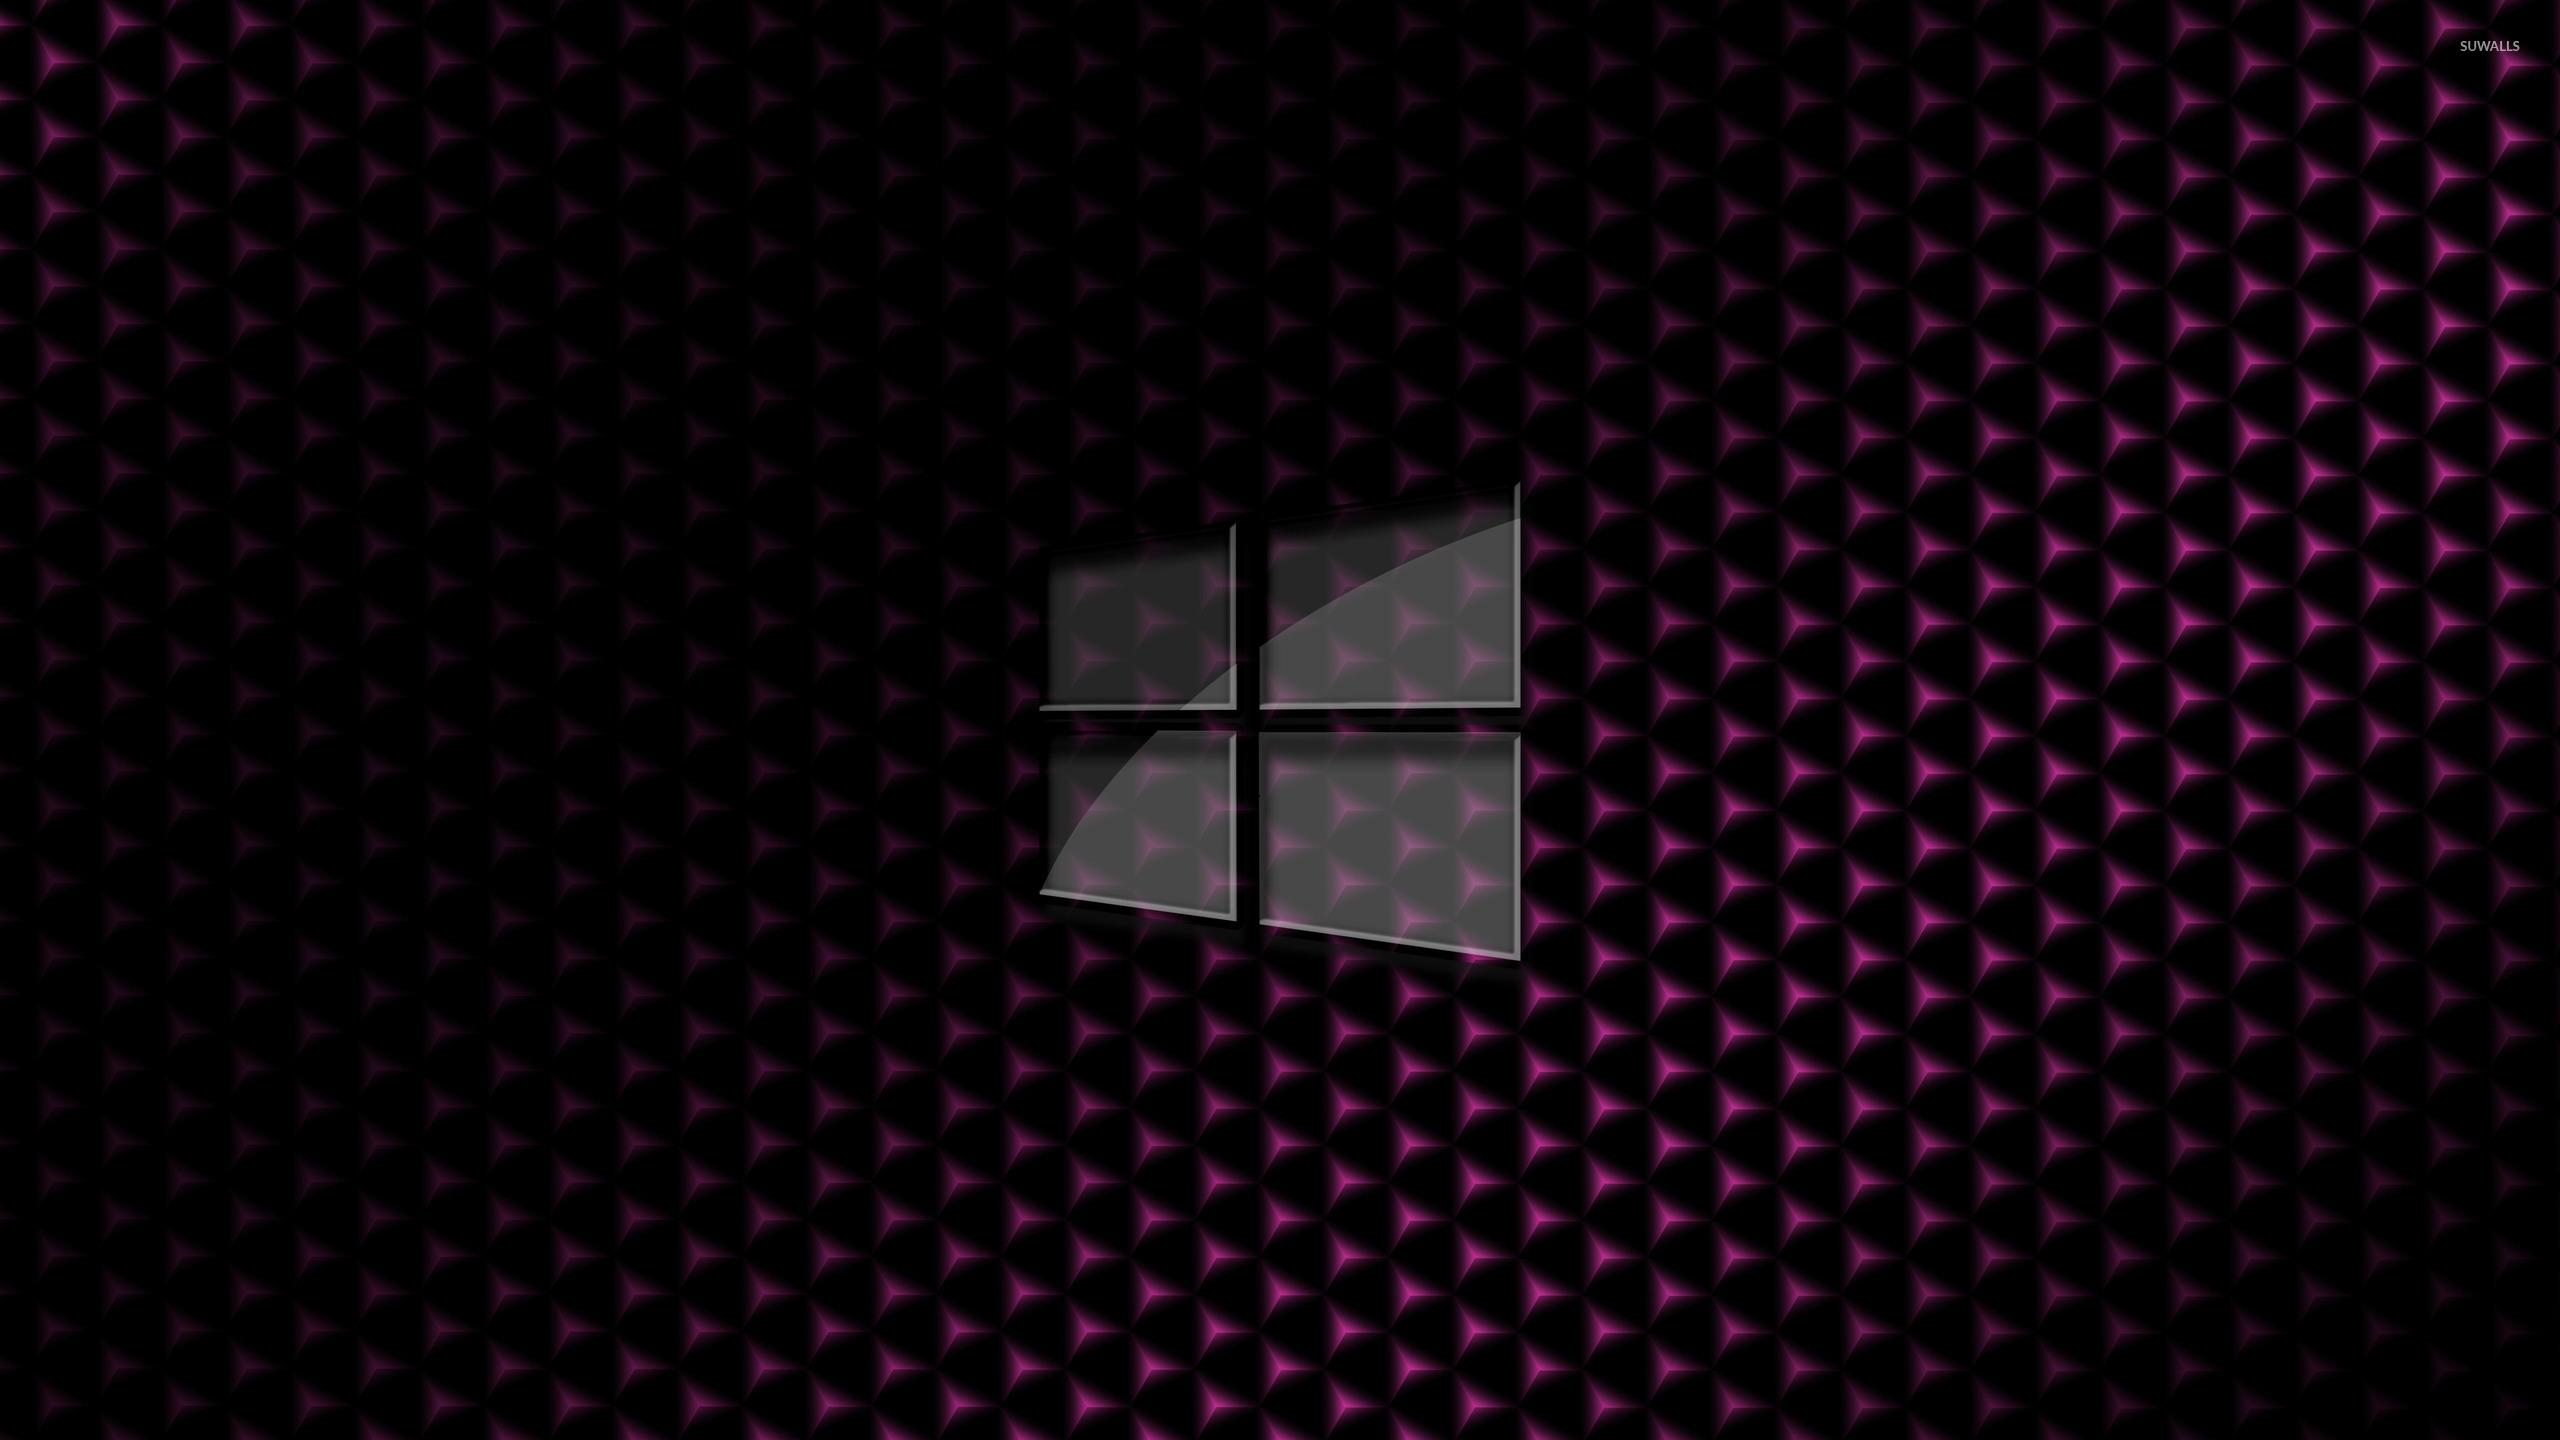 Glass Windows 10 Wallpaper : Glass windows on pink cube pattern wallpaper computer